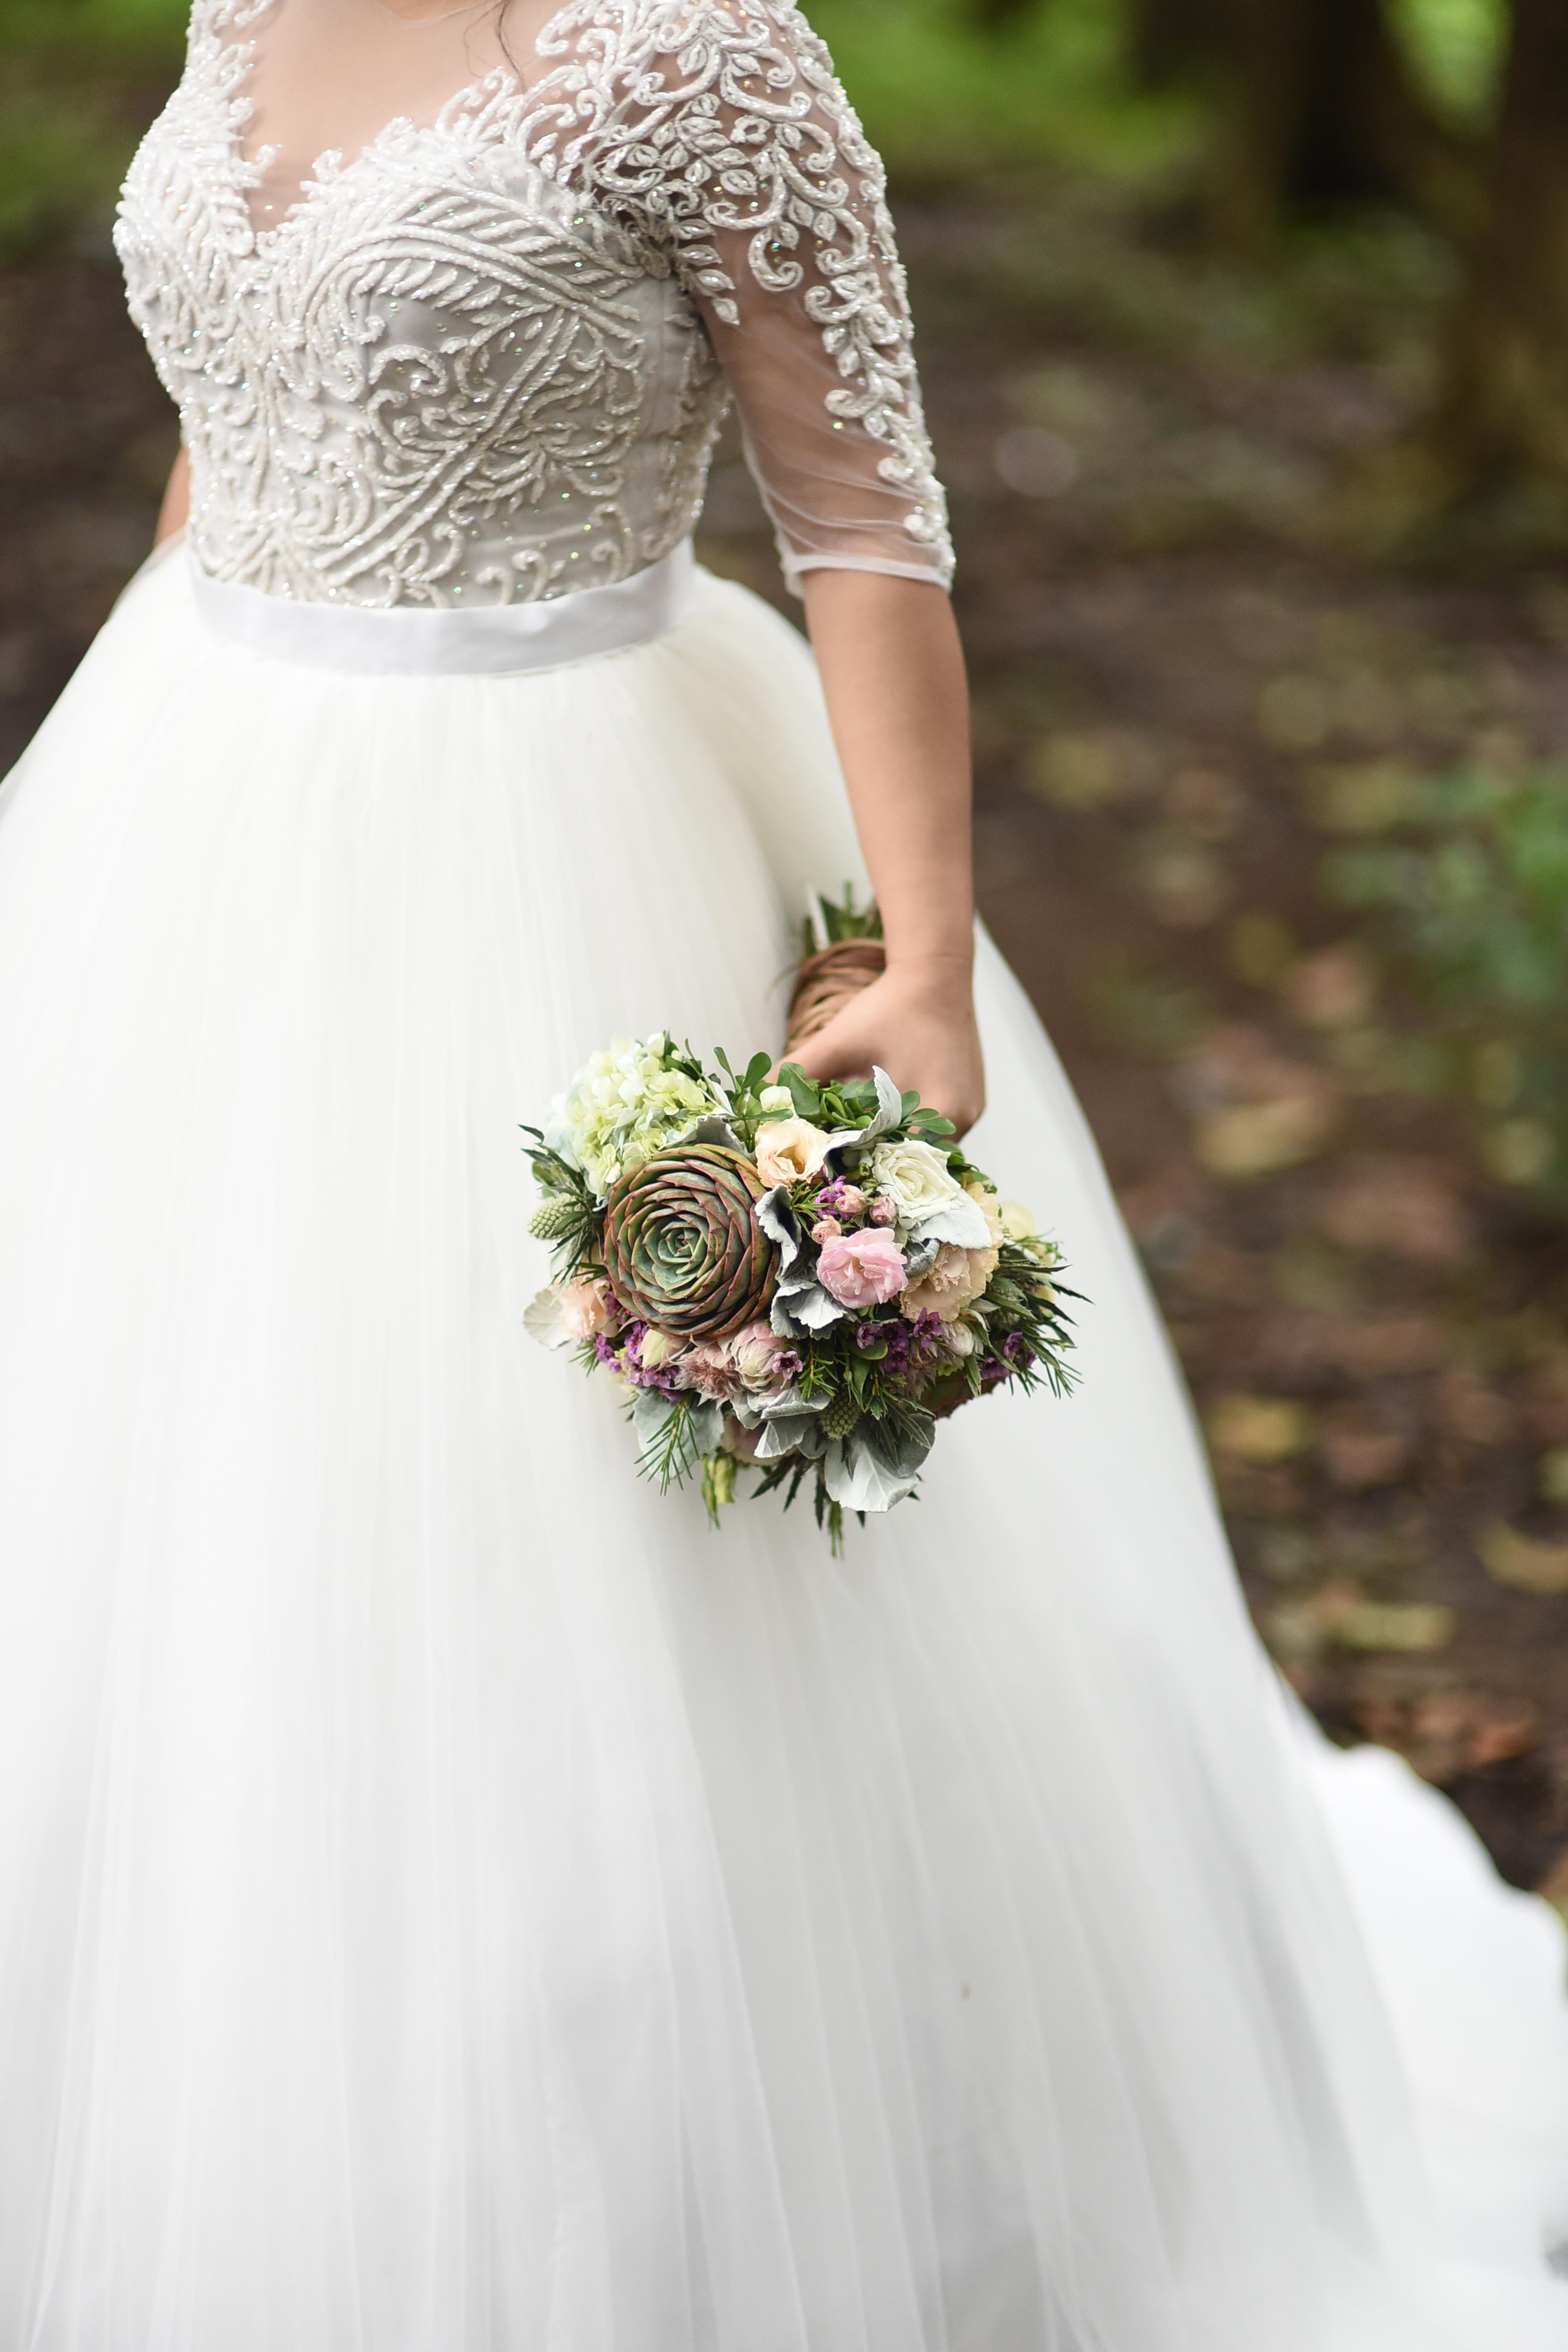 MartinCyraGiveThanks: The Rustic Garden Wedding   aymisayra